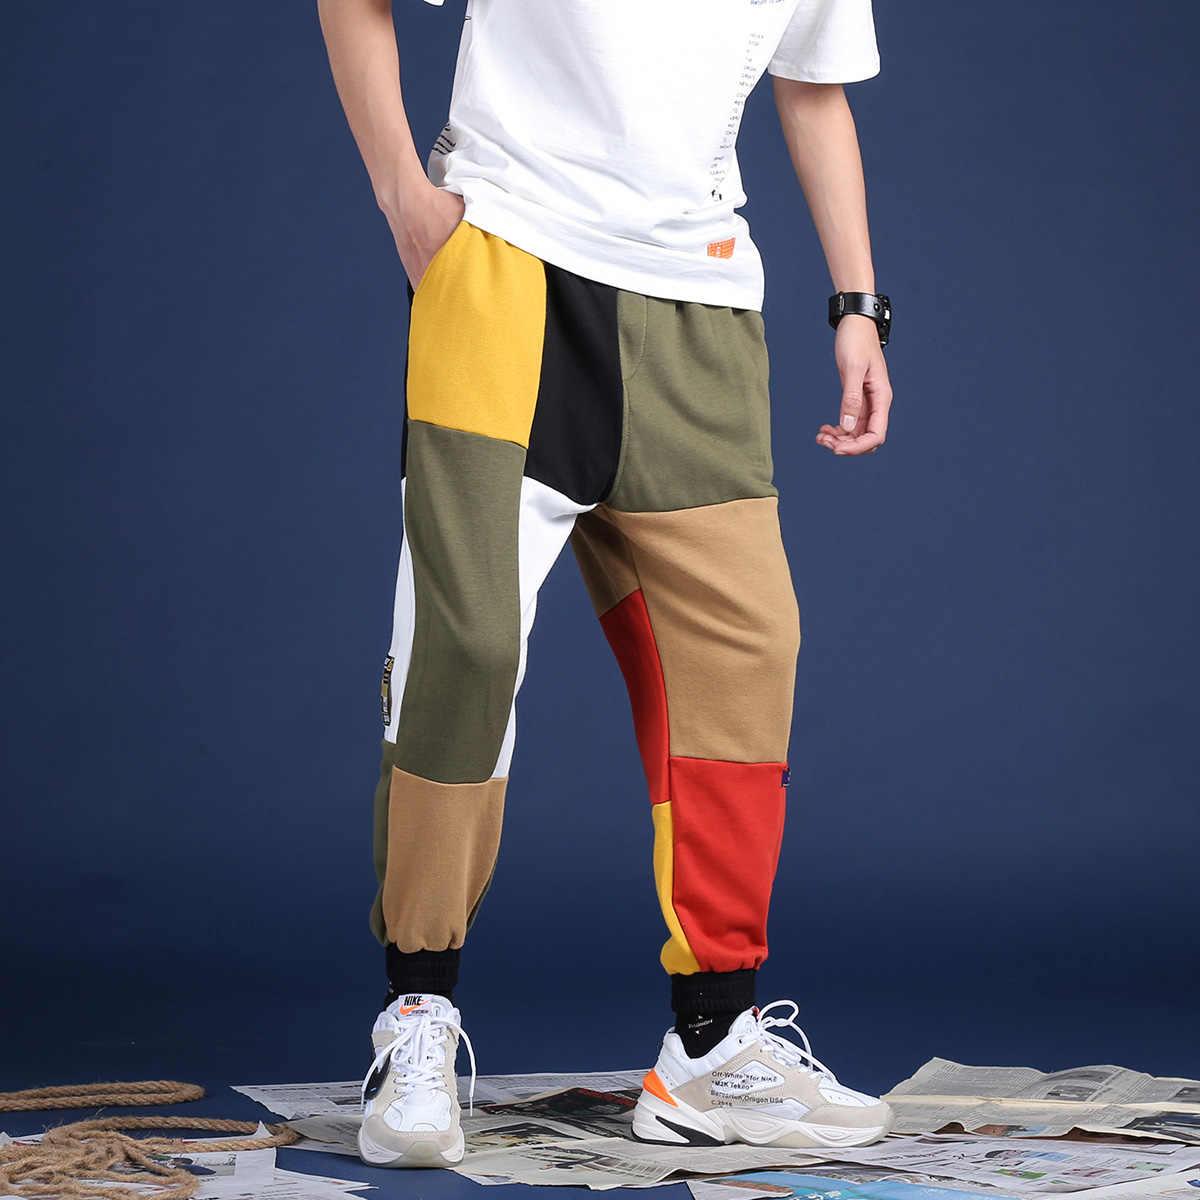 bafed27383663 ... EFUNGAL Multi-color Patchwork Casual Pants Men 2019 Hip Hop Joggers  Fashion Harajuku Streetwear Urban ...